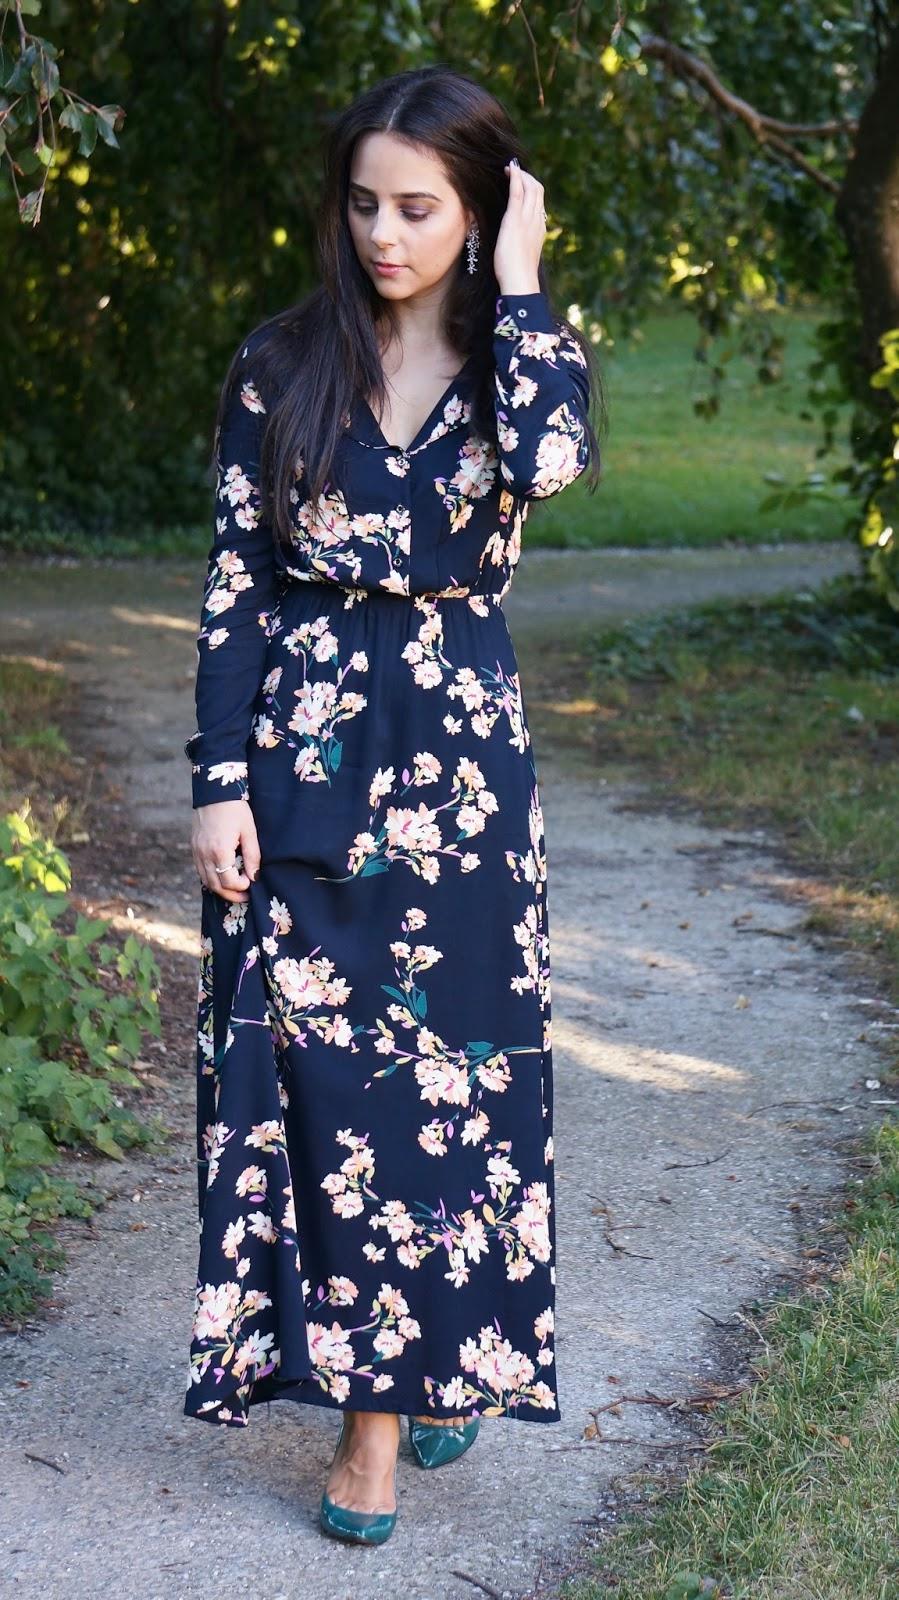 603cd29471 Thaïs Ribbon X Shein: Floral Maxi Dress   Thaïs Ribbon